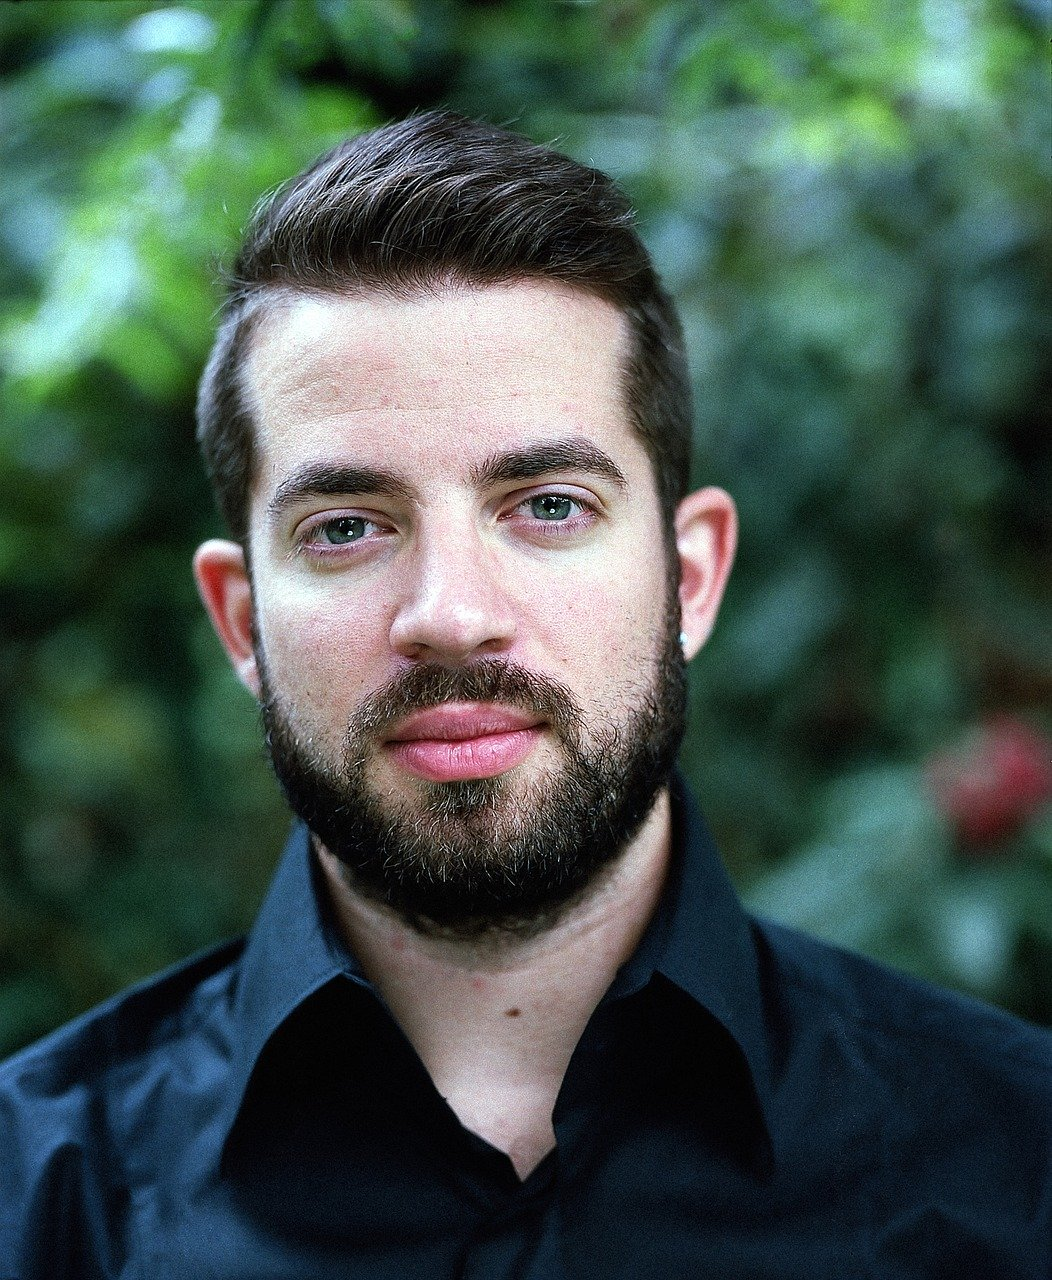 young man, portrait, beard